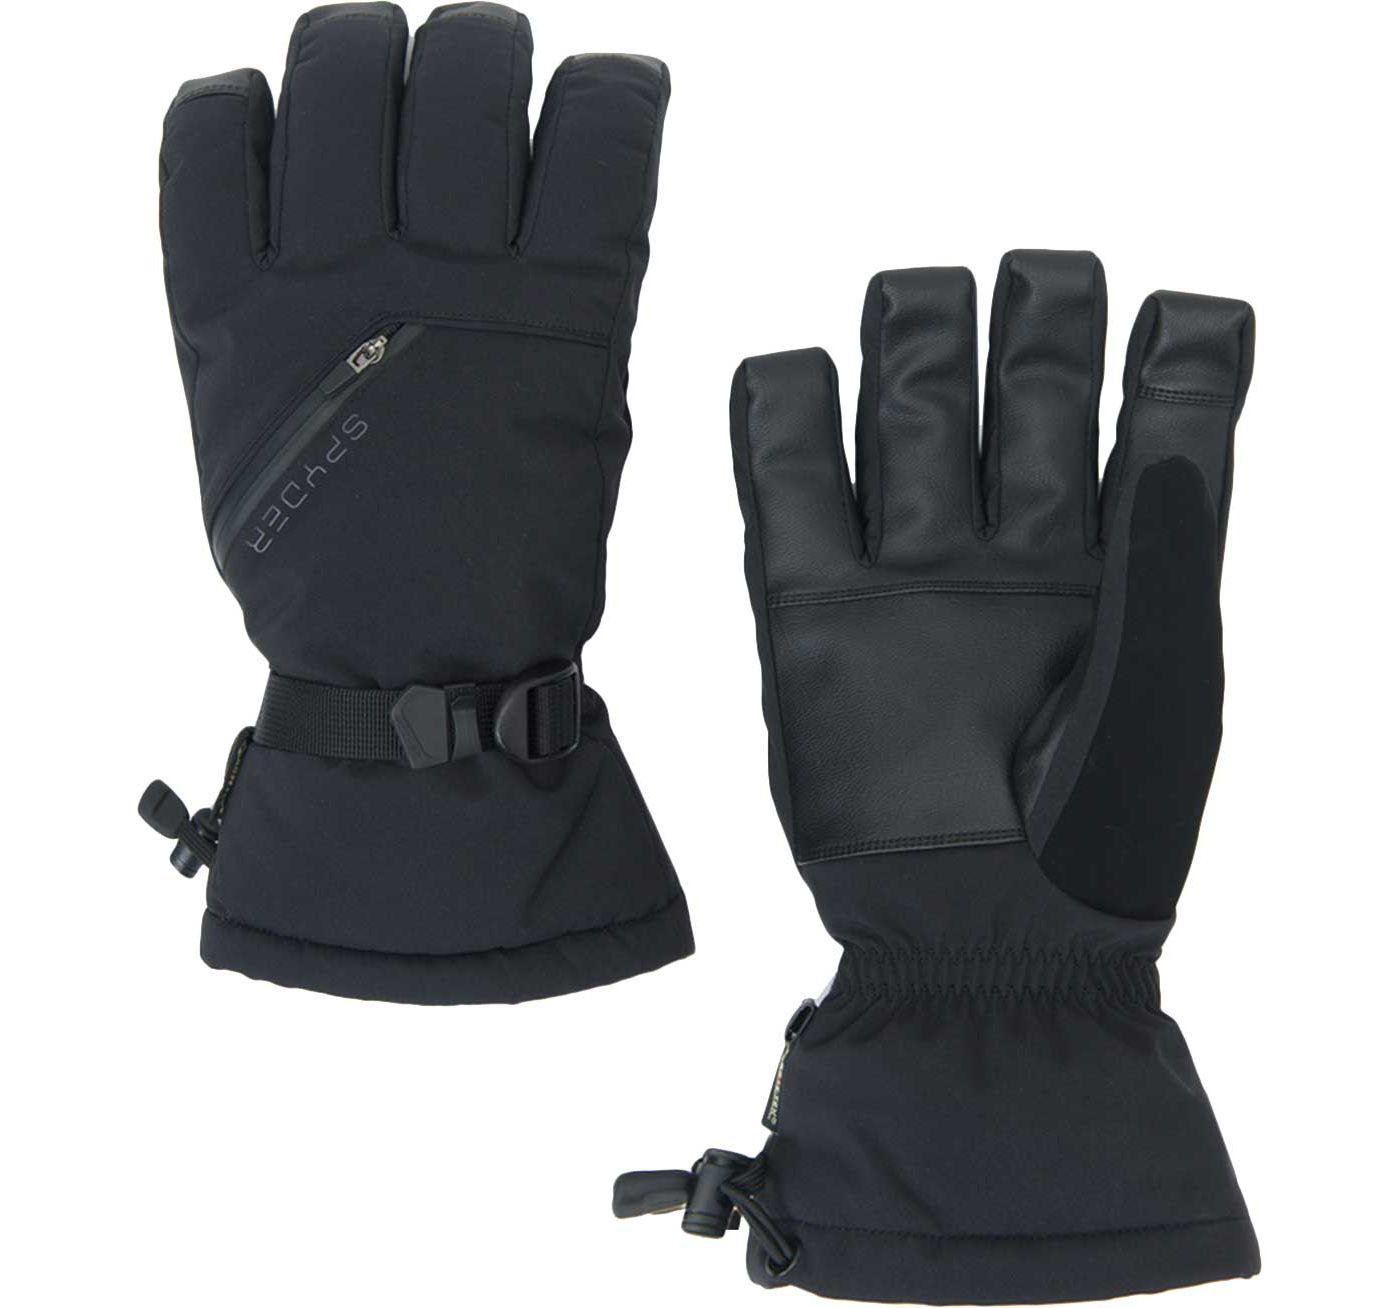 Spyder Vital 3-in-1 GTX Gloves